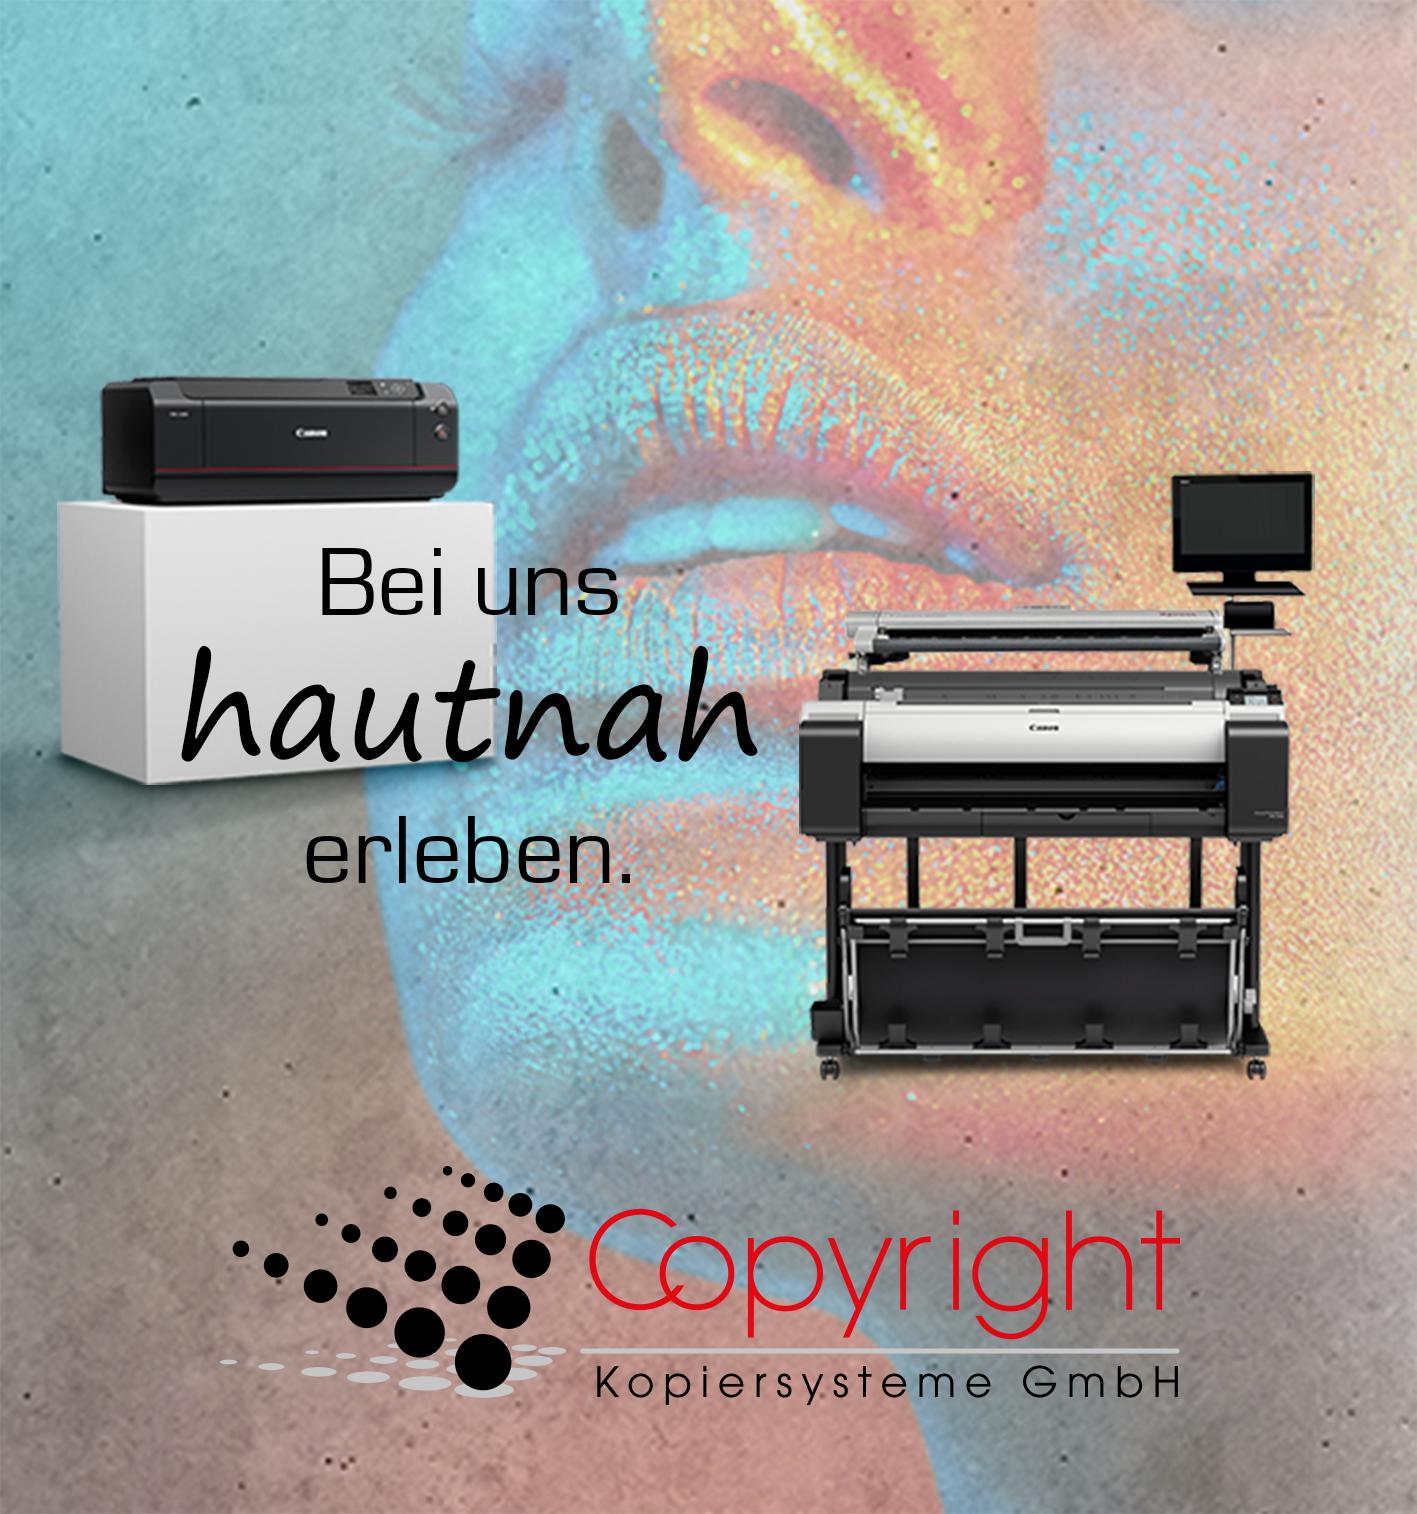 Copyright Kopiersysteme GmbH